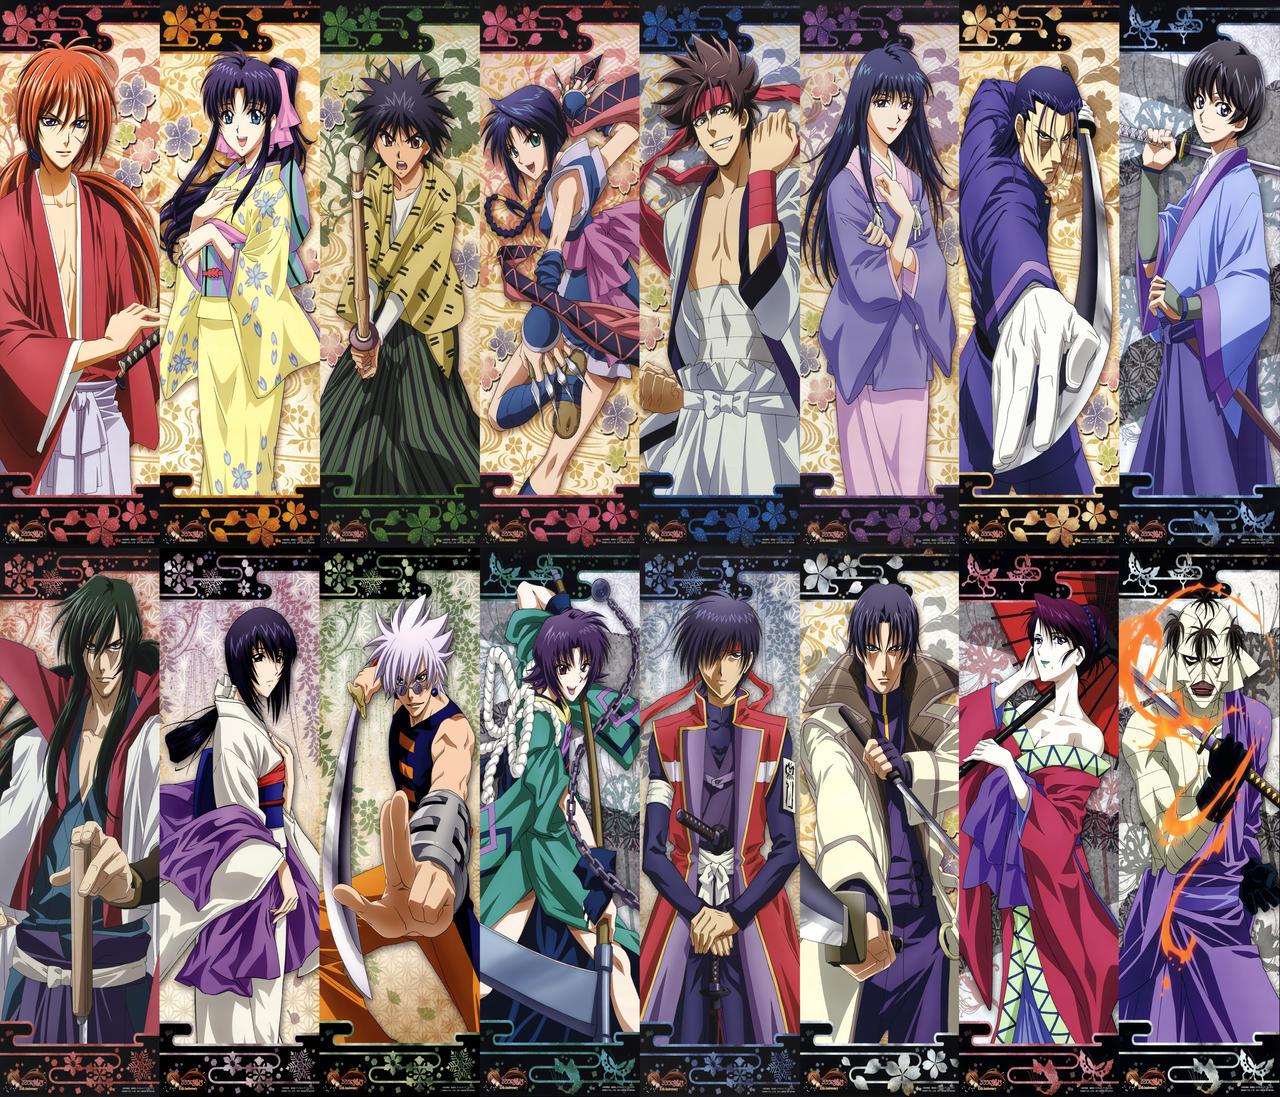 Rurouni Kenshin Characters by Narusailor